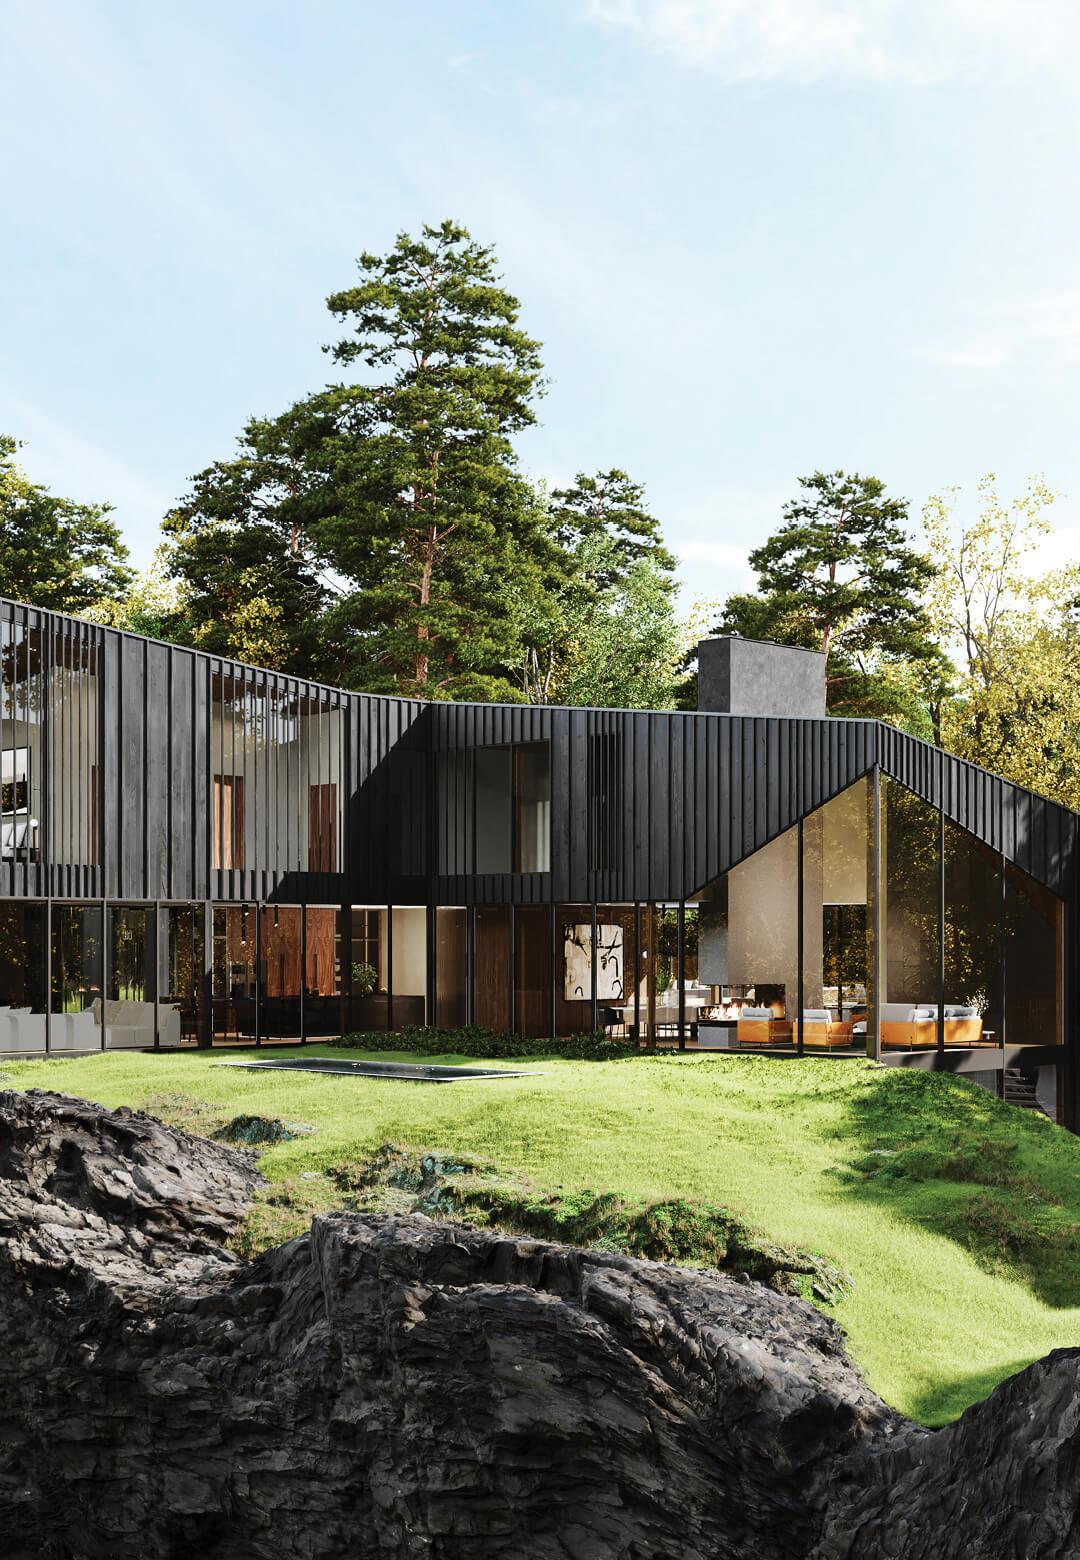 The Sylvan Rock luxury residence by Aston Martin Design x S3 Architecture   Sylvan Rock   Aston Martin Design x S3 Architecture   STIRworld